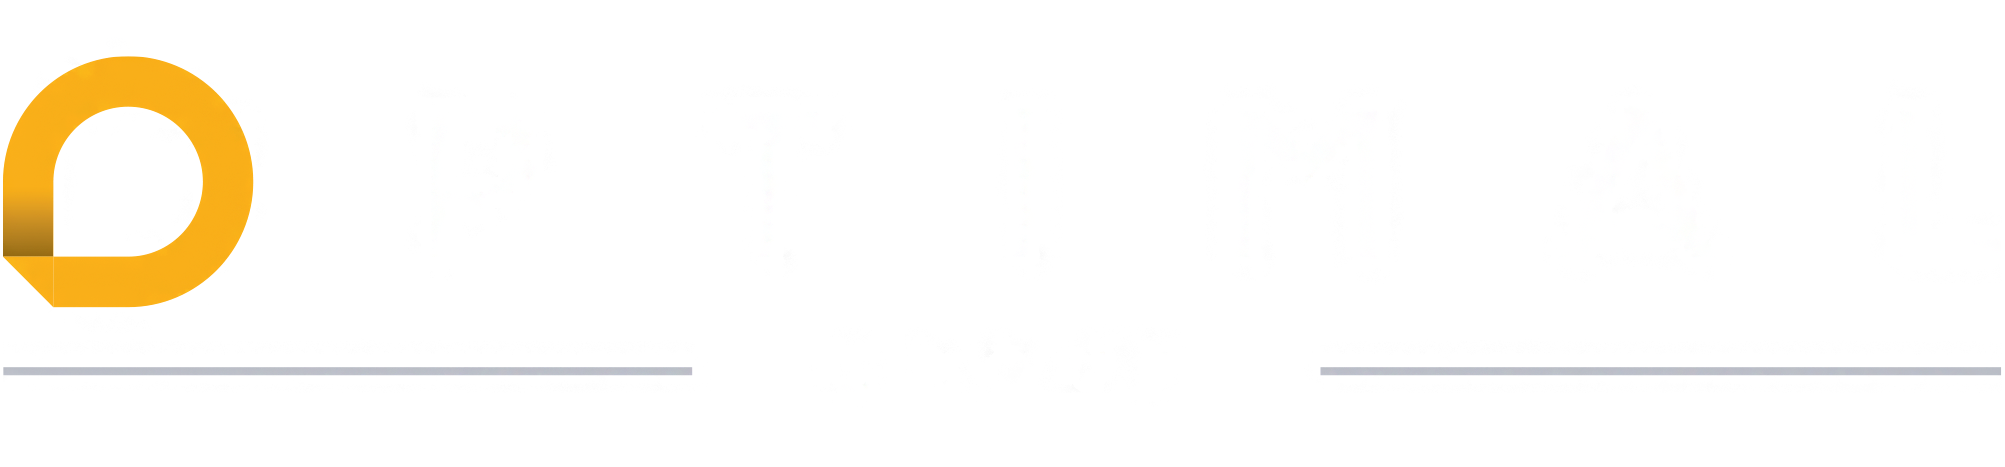 The Optimal Group